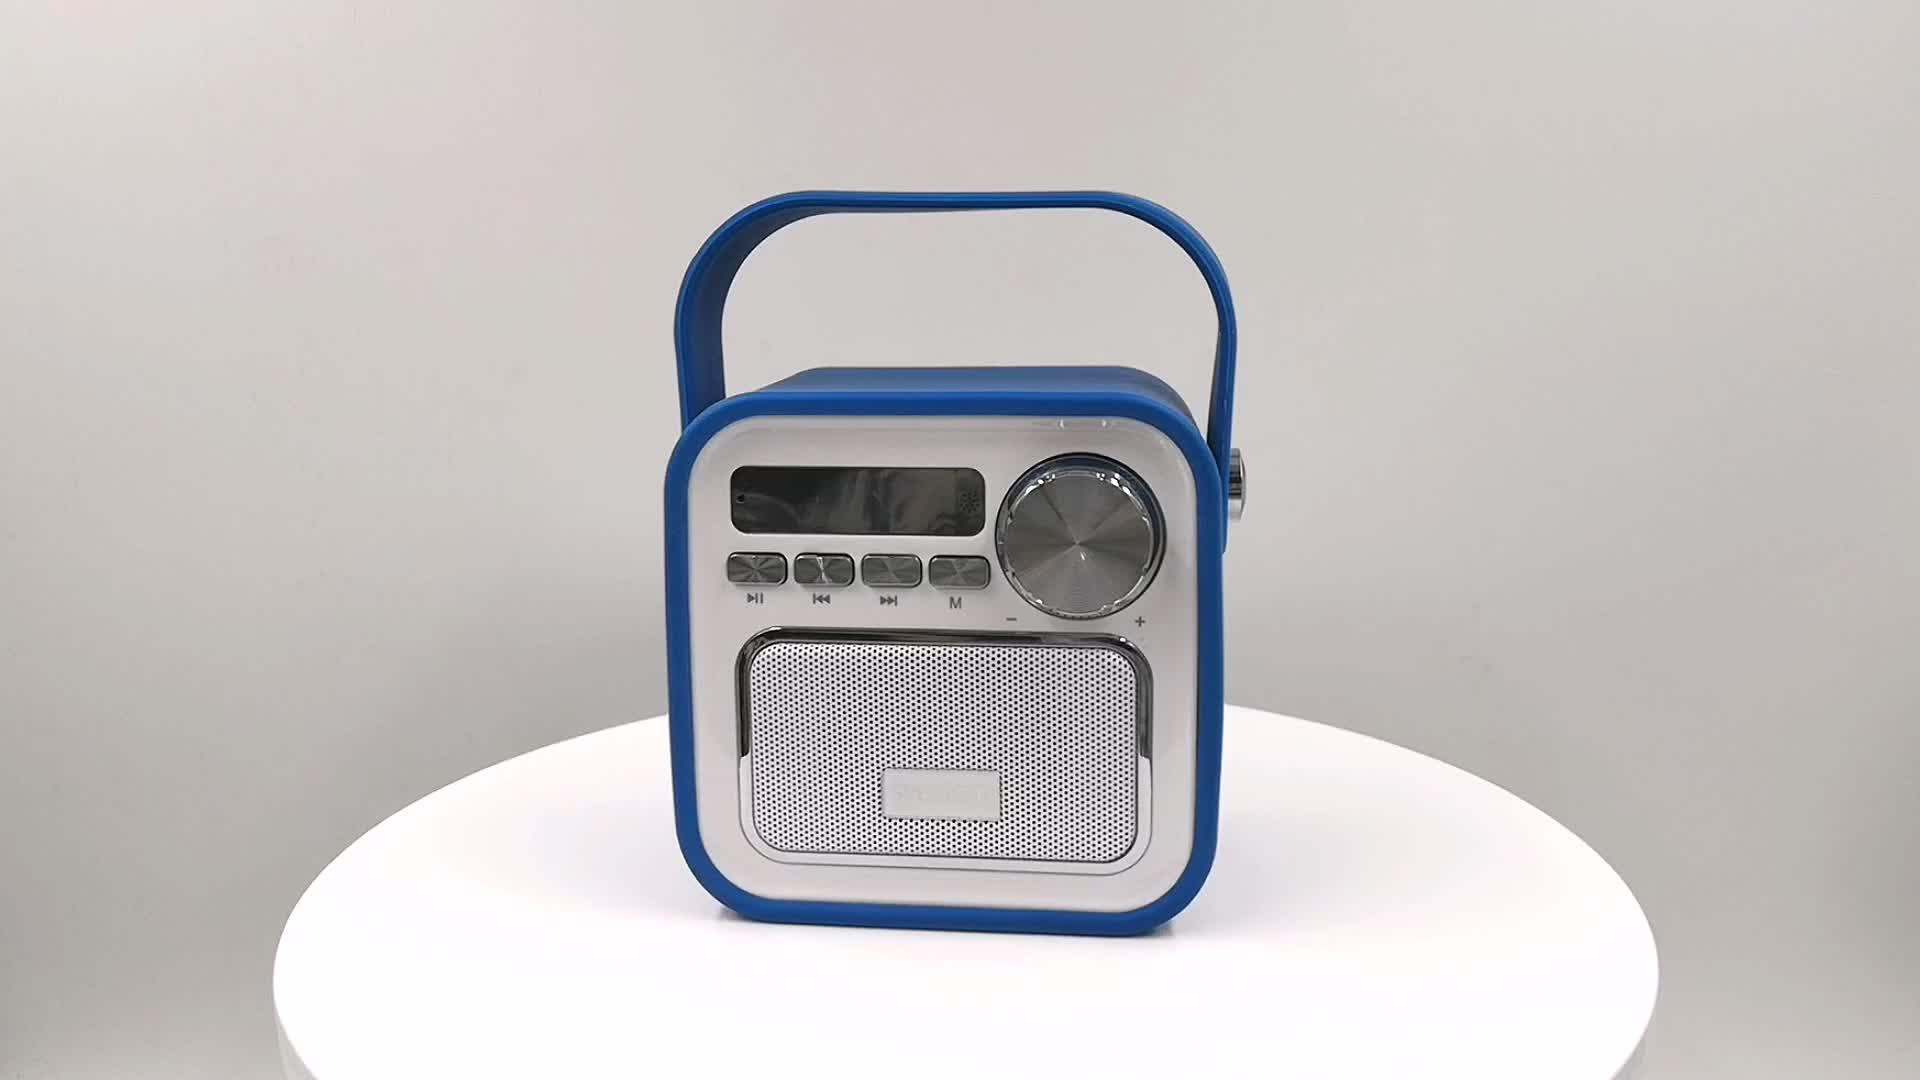 Outdoor Box Wireless Fm Bluetooth Remote Speakers Usb Two Way Portable Microphone Mini Digital Super Bass Speaker With Dab Radio